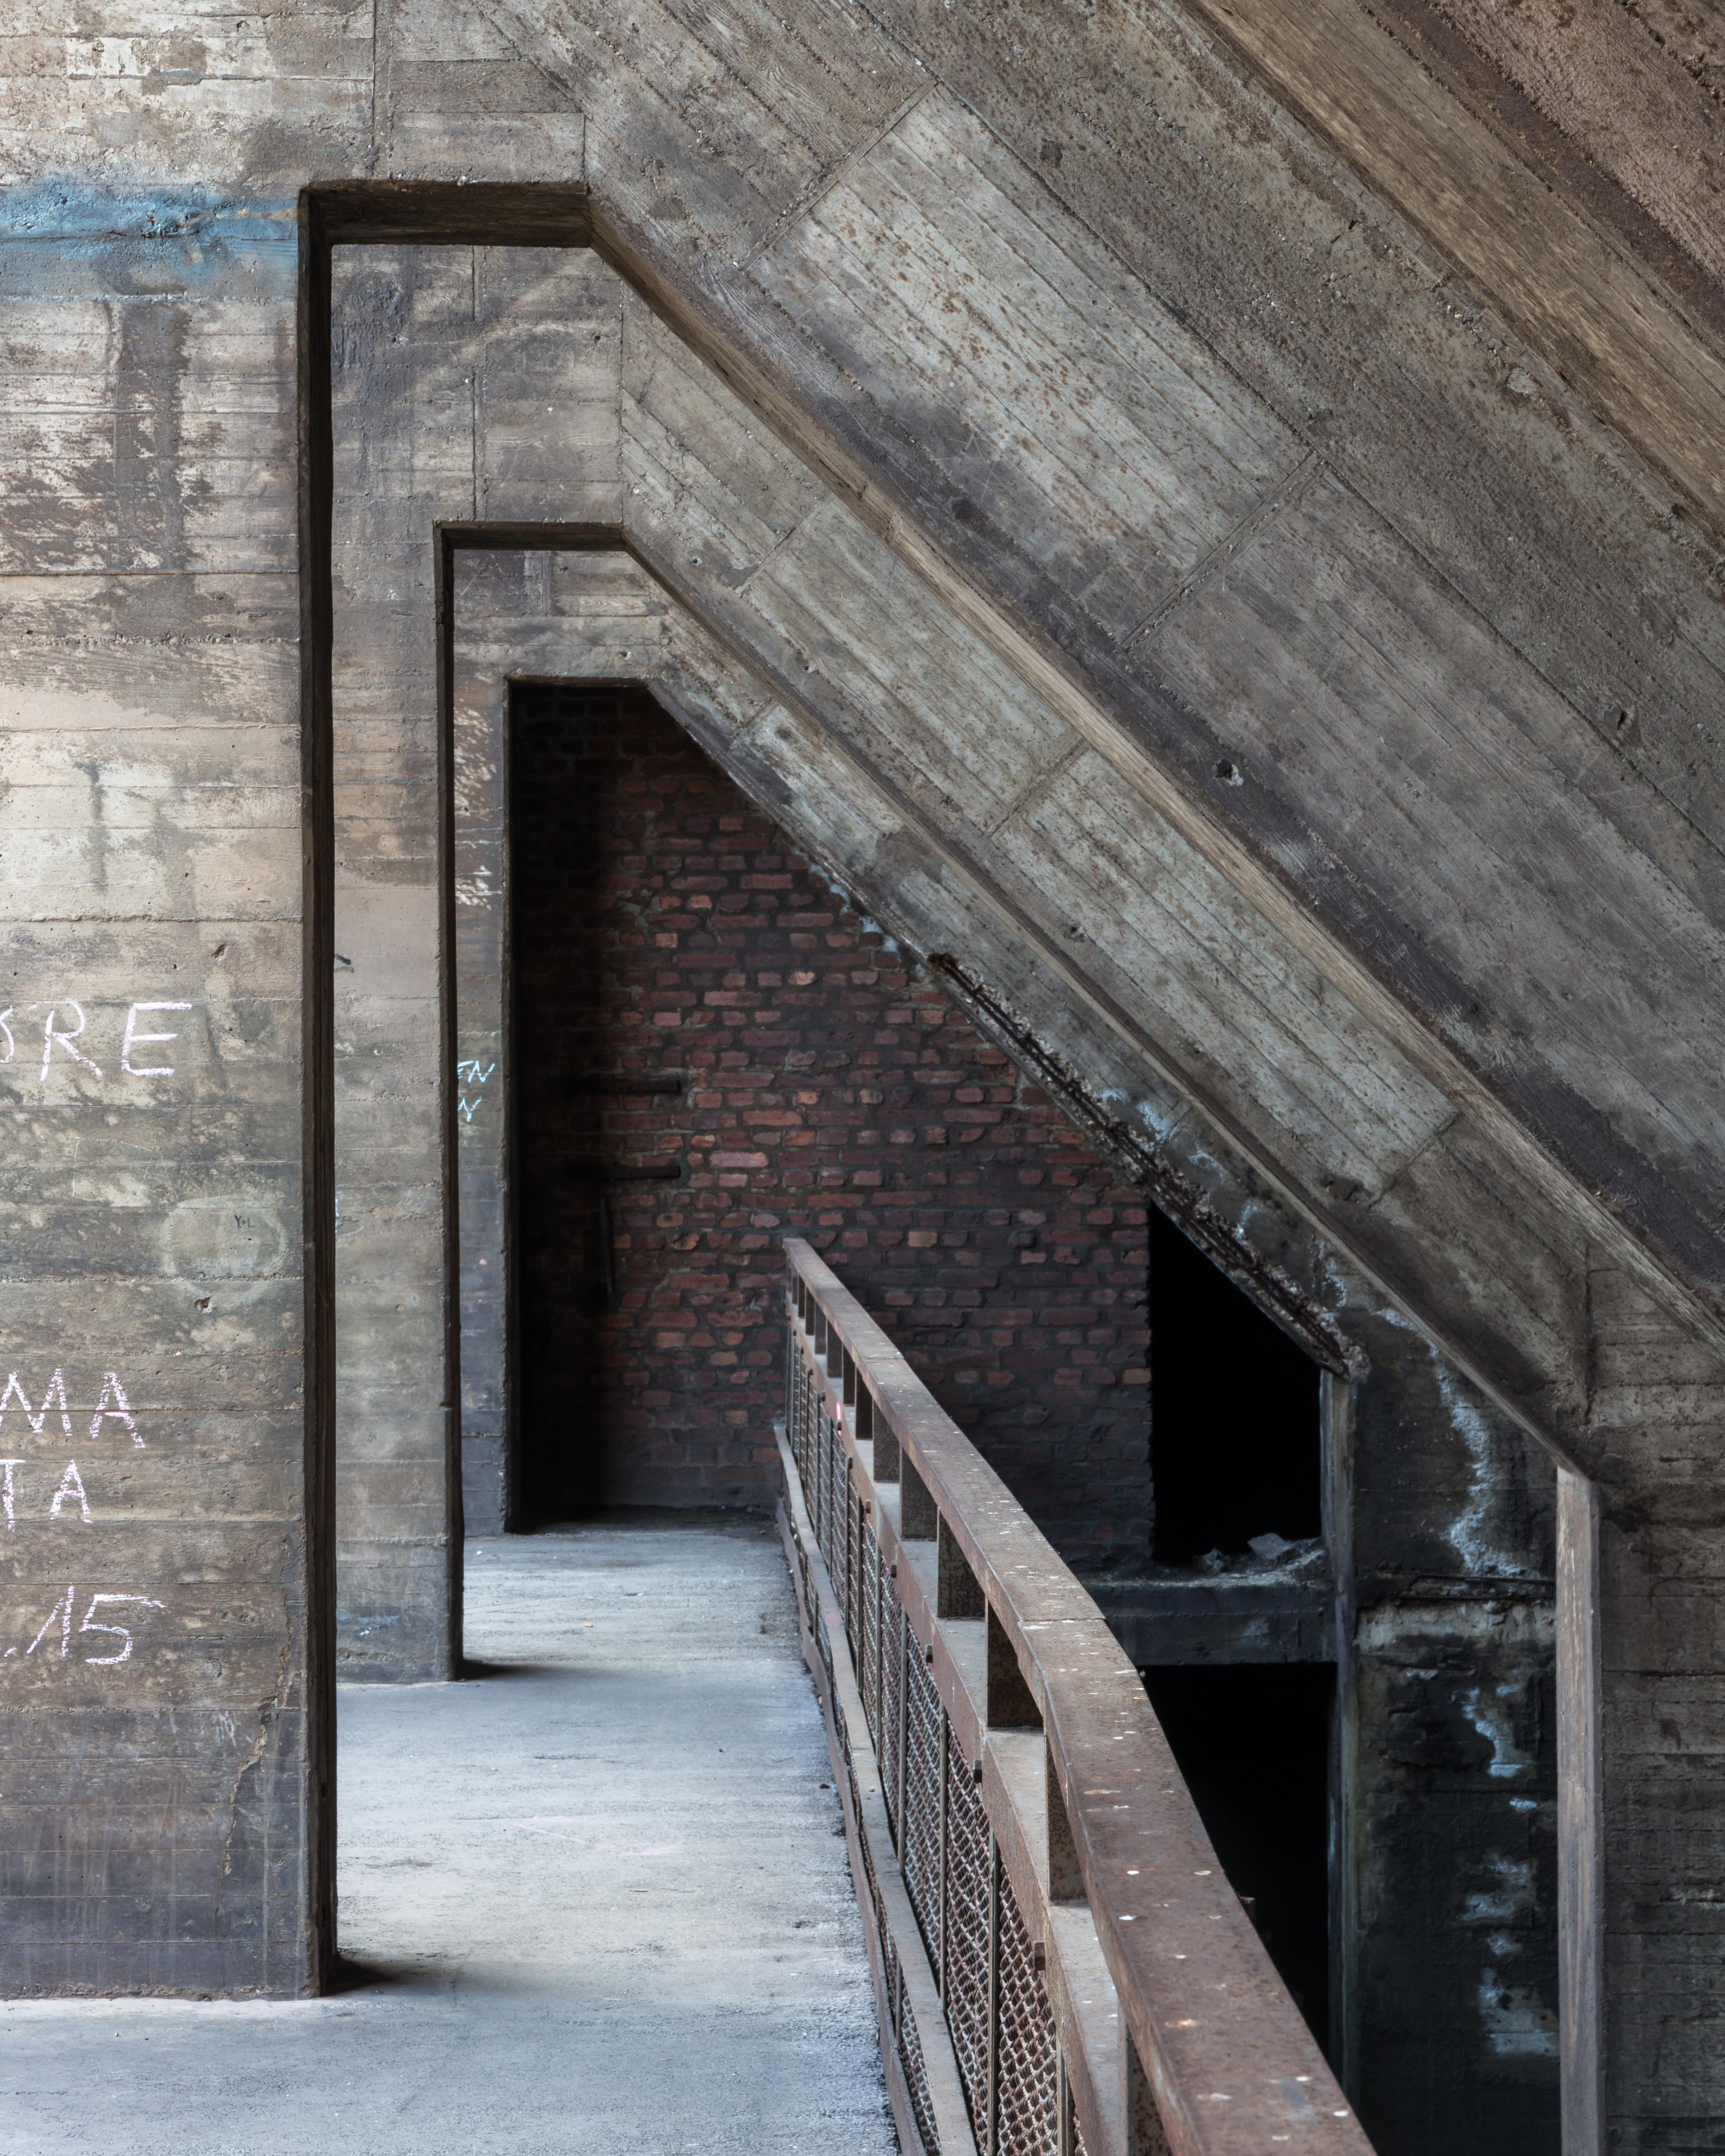 Nord бетон заказать бетон миксер в барнауле